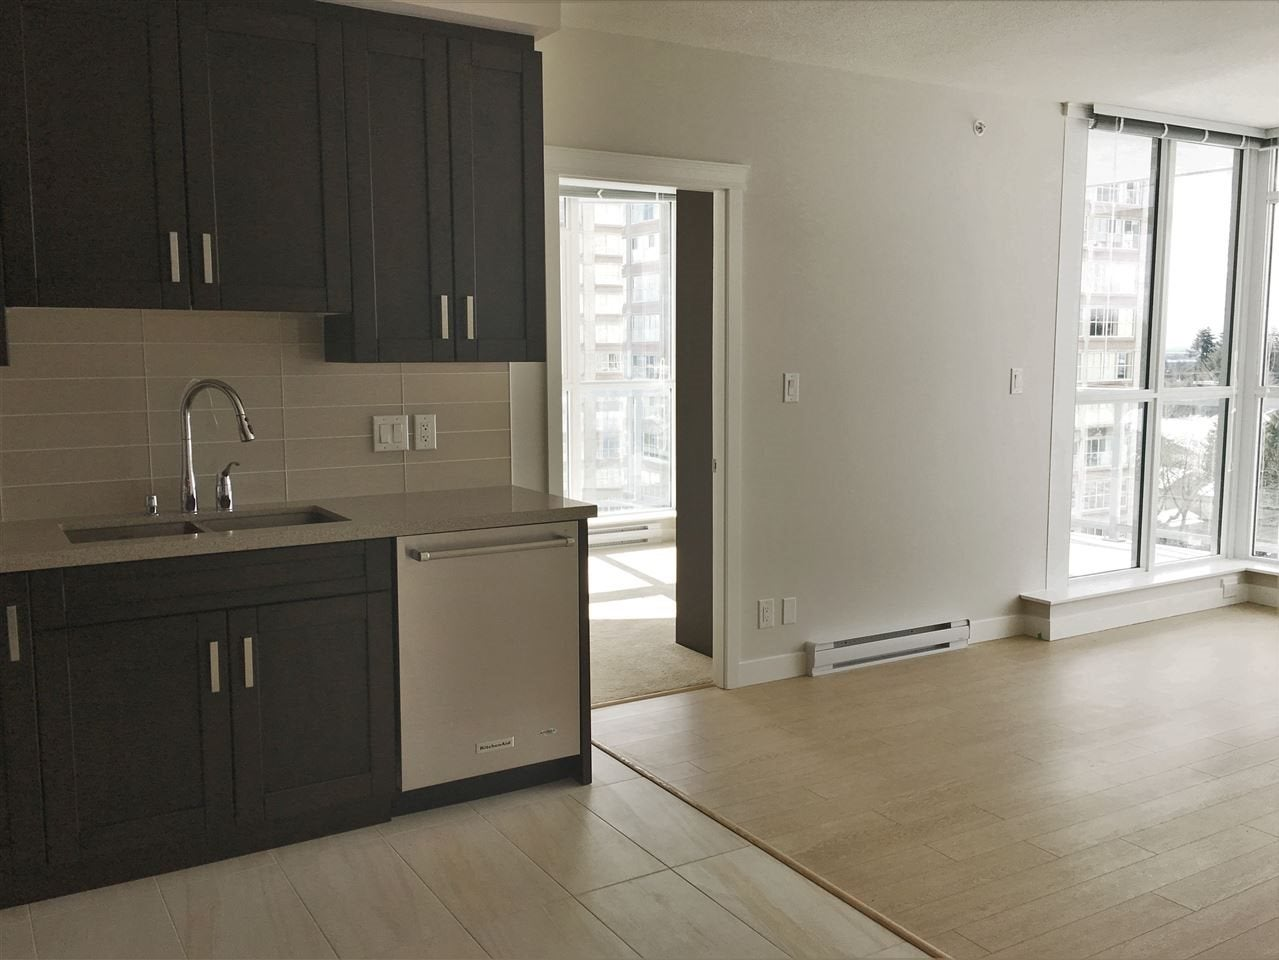 811 11967 80 AVENUE - Scottsdale Apartment/Condo for sale, 2 Bedrooms (R2555518) - #3